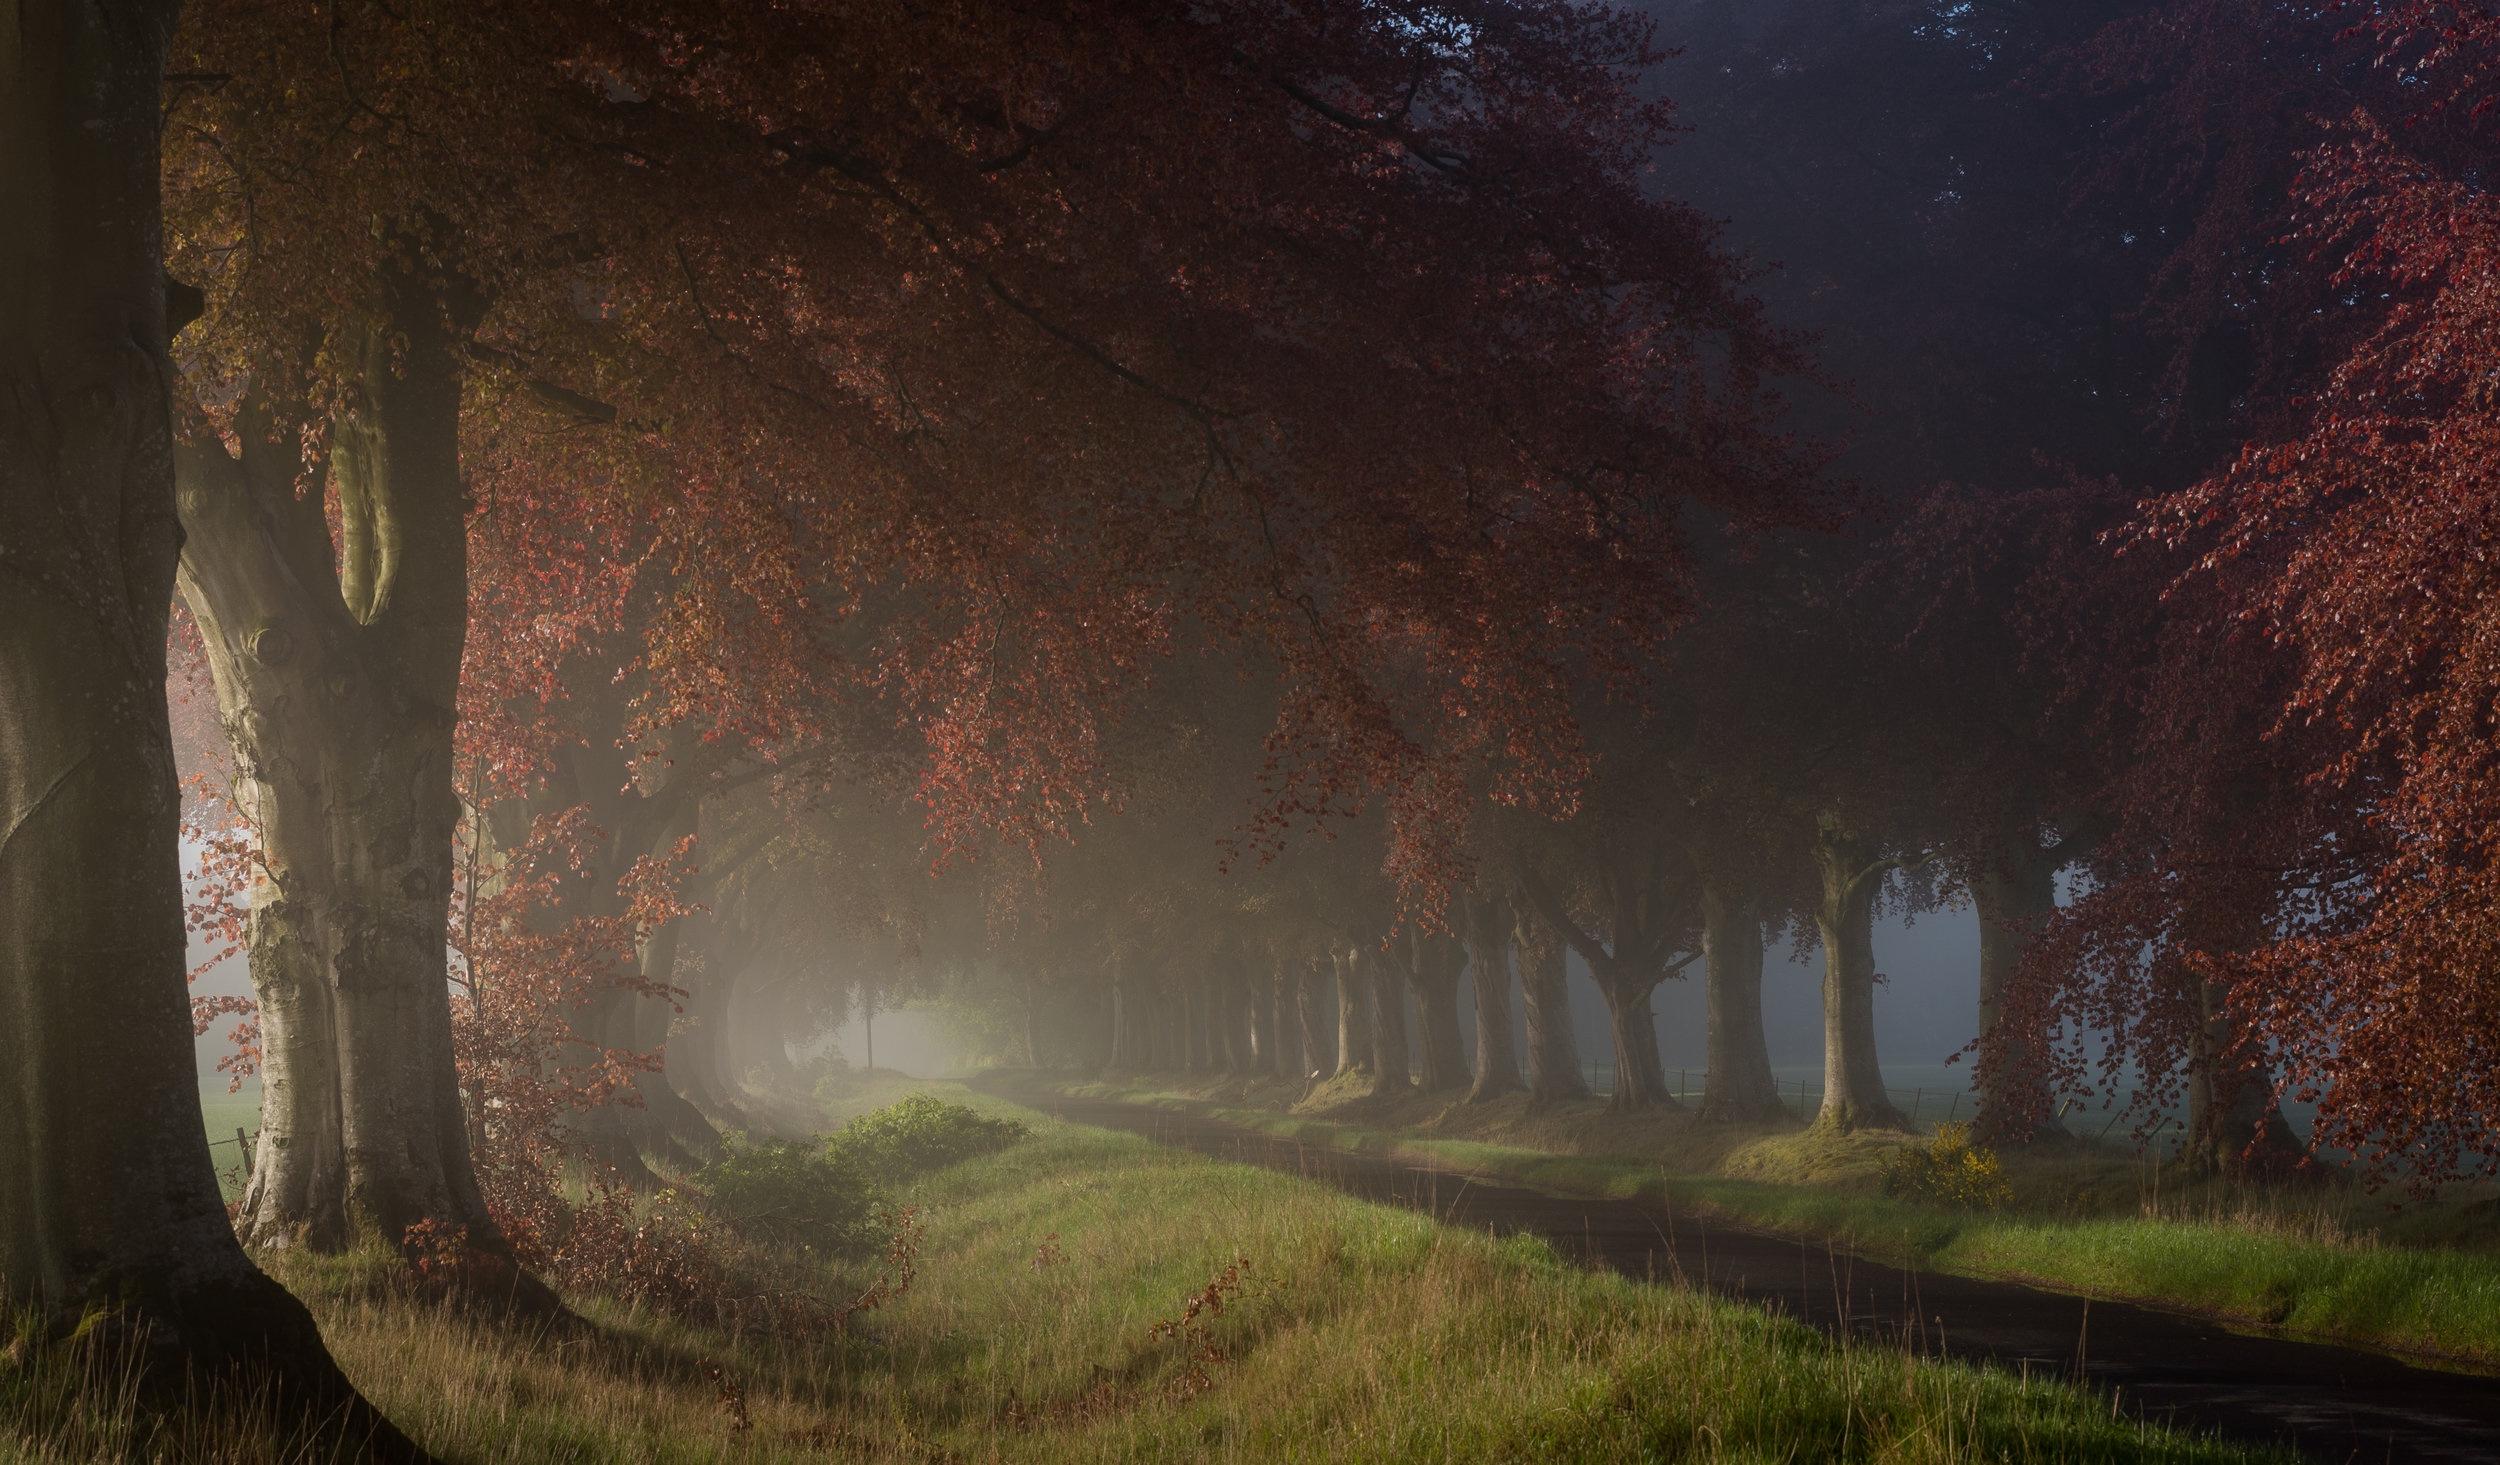 Stormontfield Fog by Katherine Fotheringham